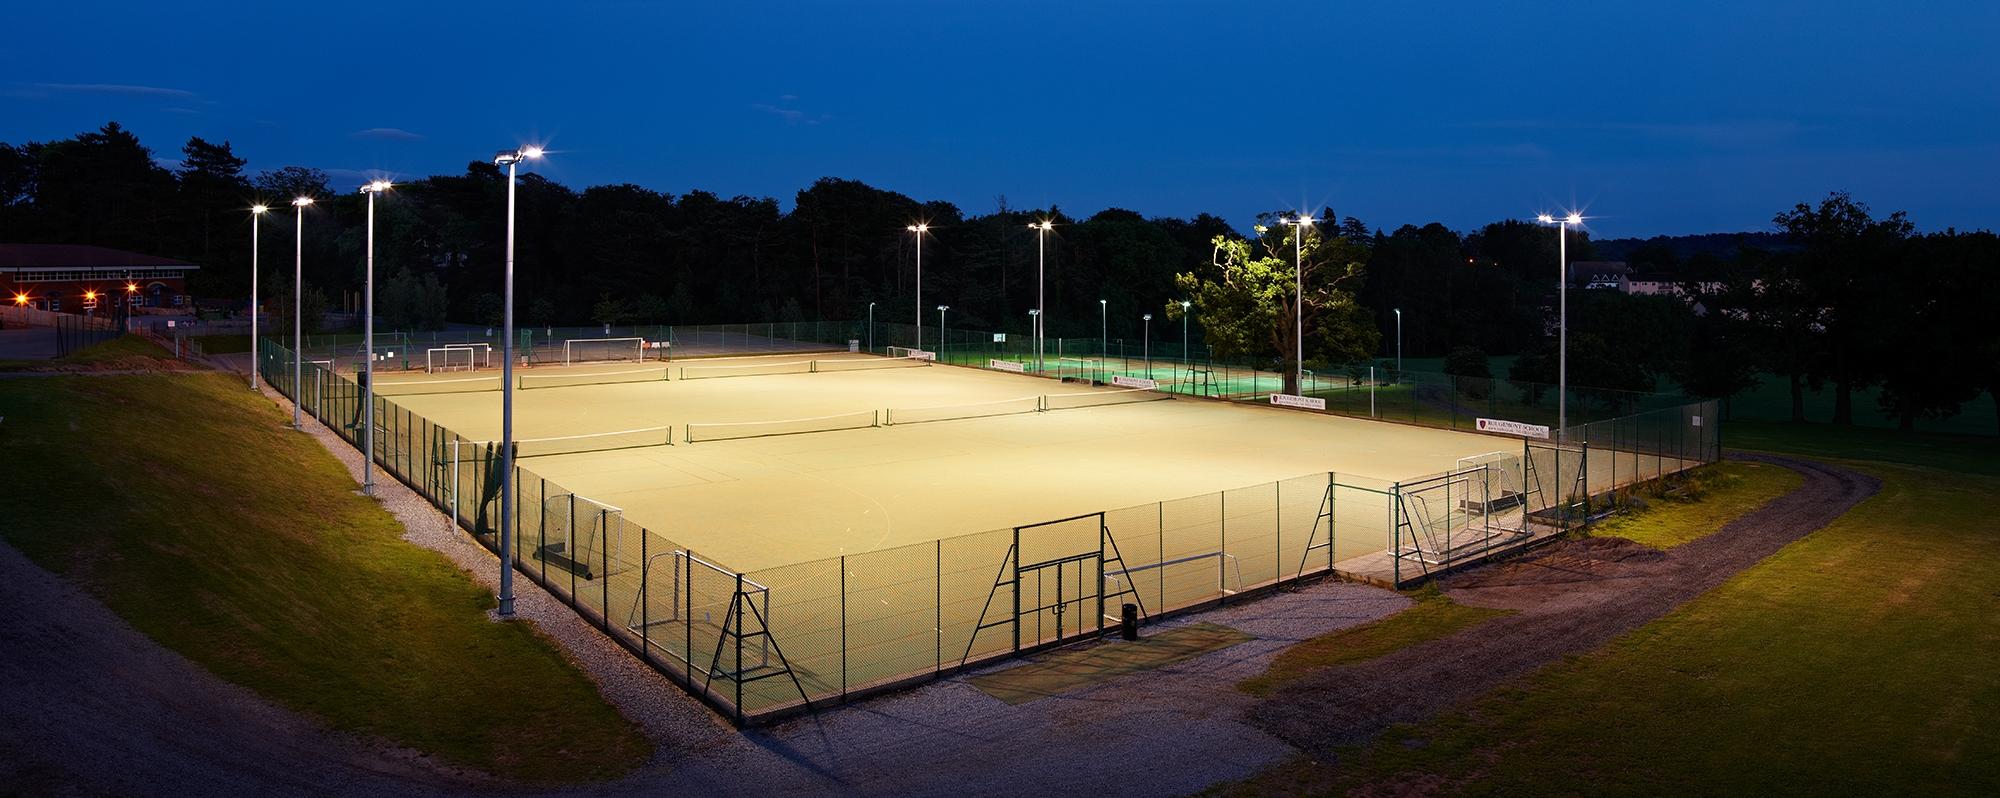 Tennis Wales Partnership